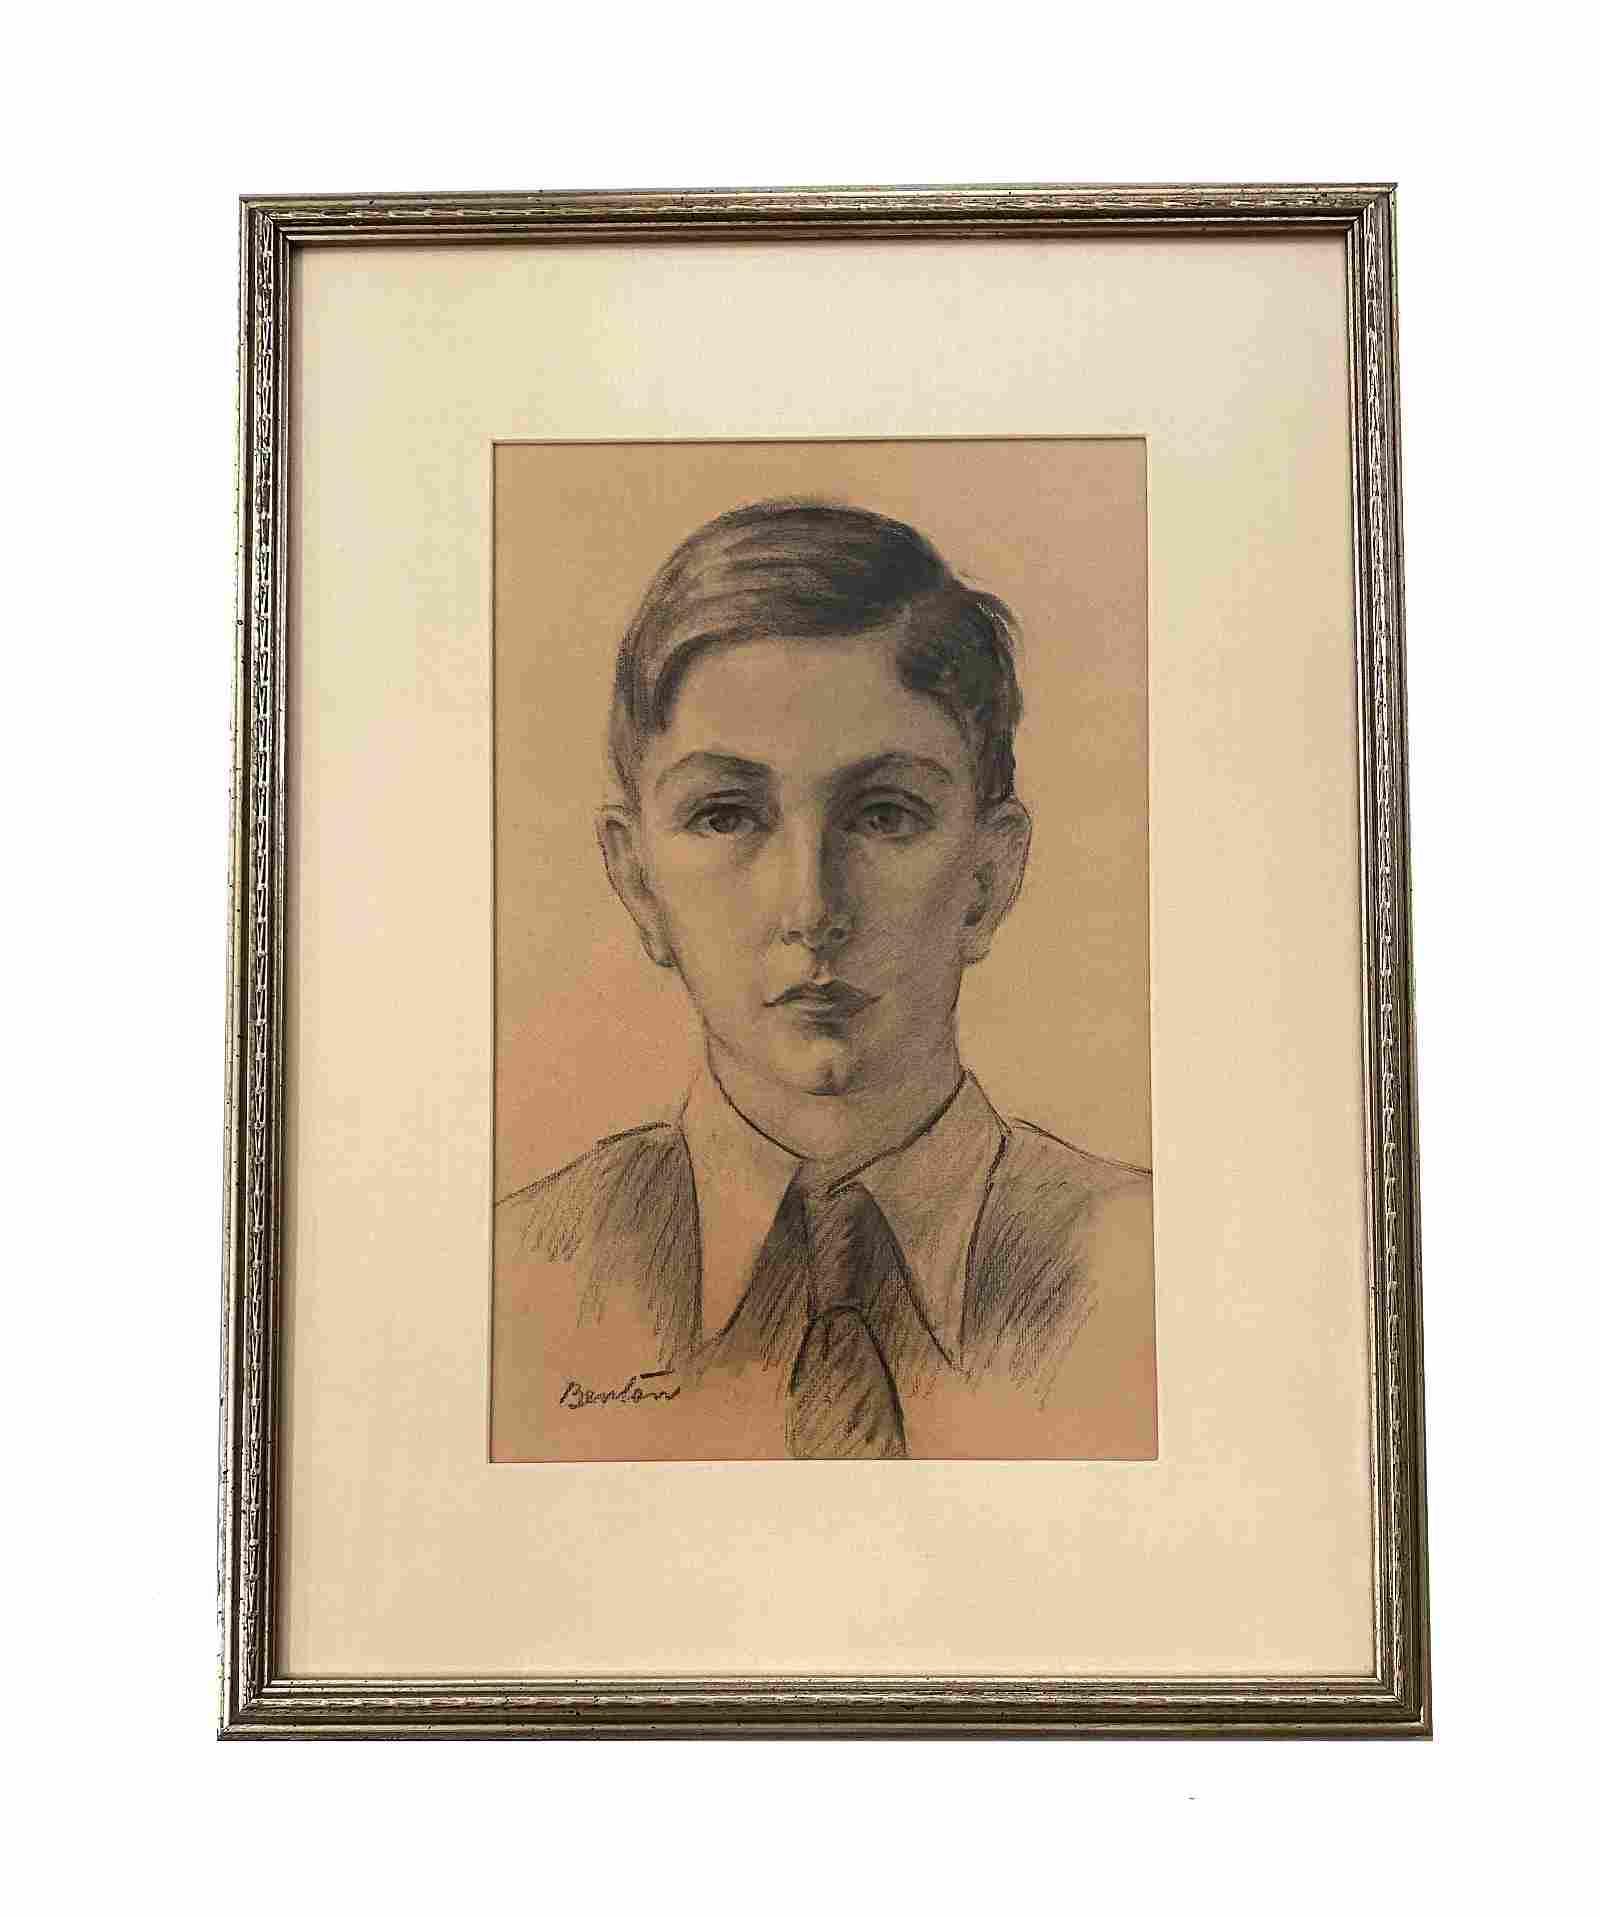 Thomas Hart Benton (1889 - 1975) American